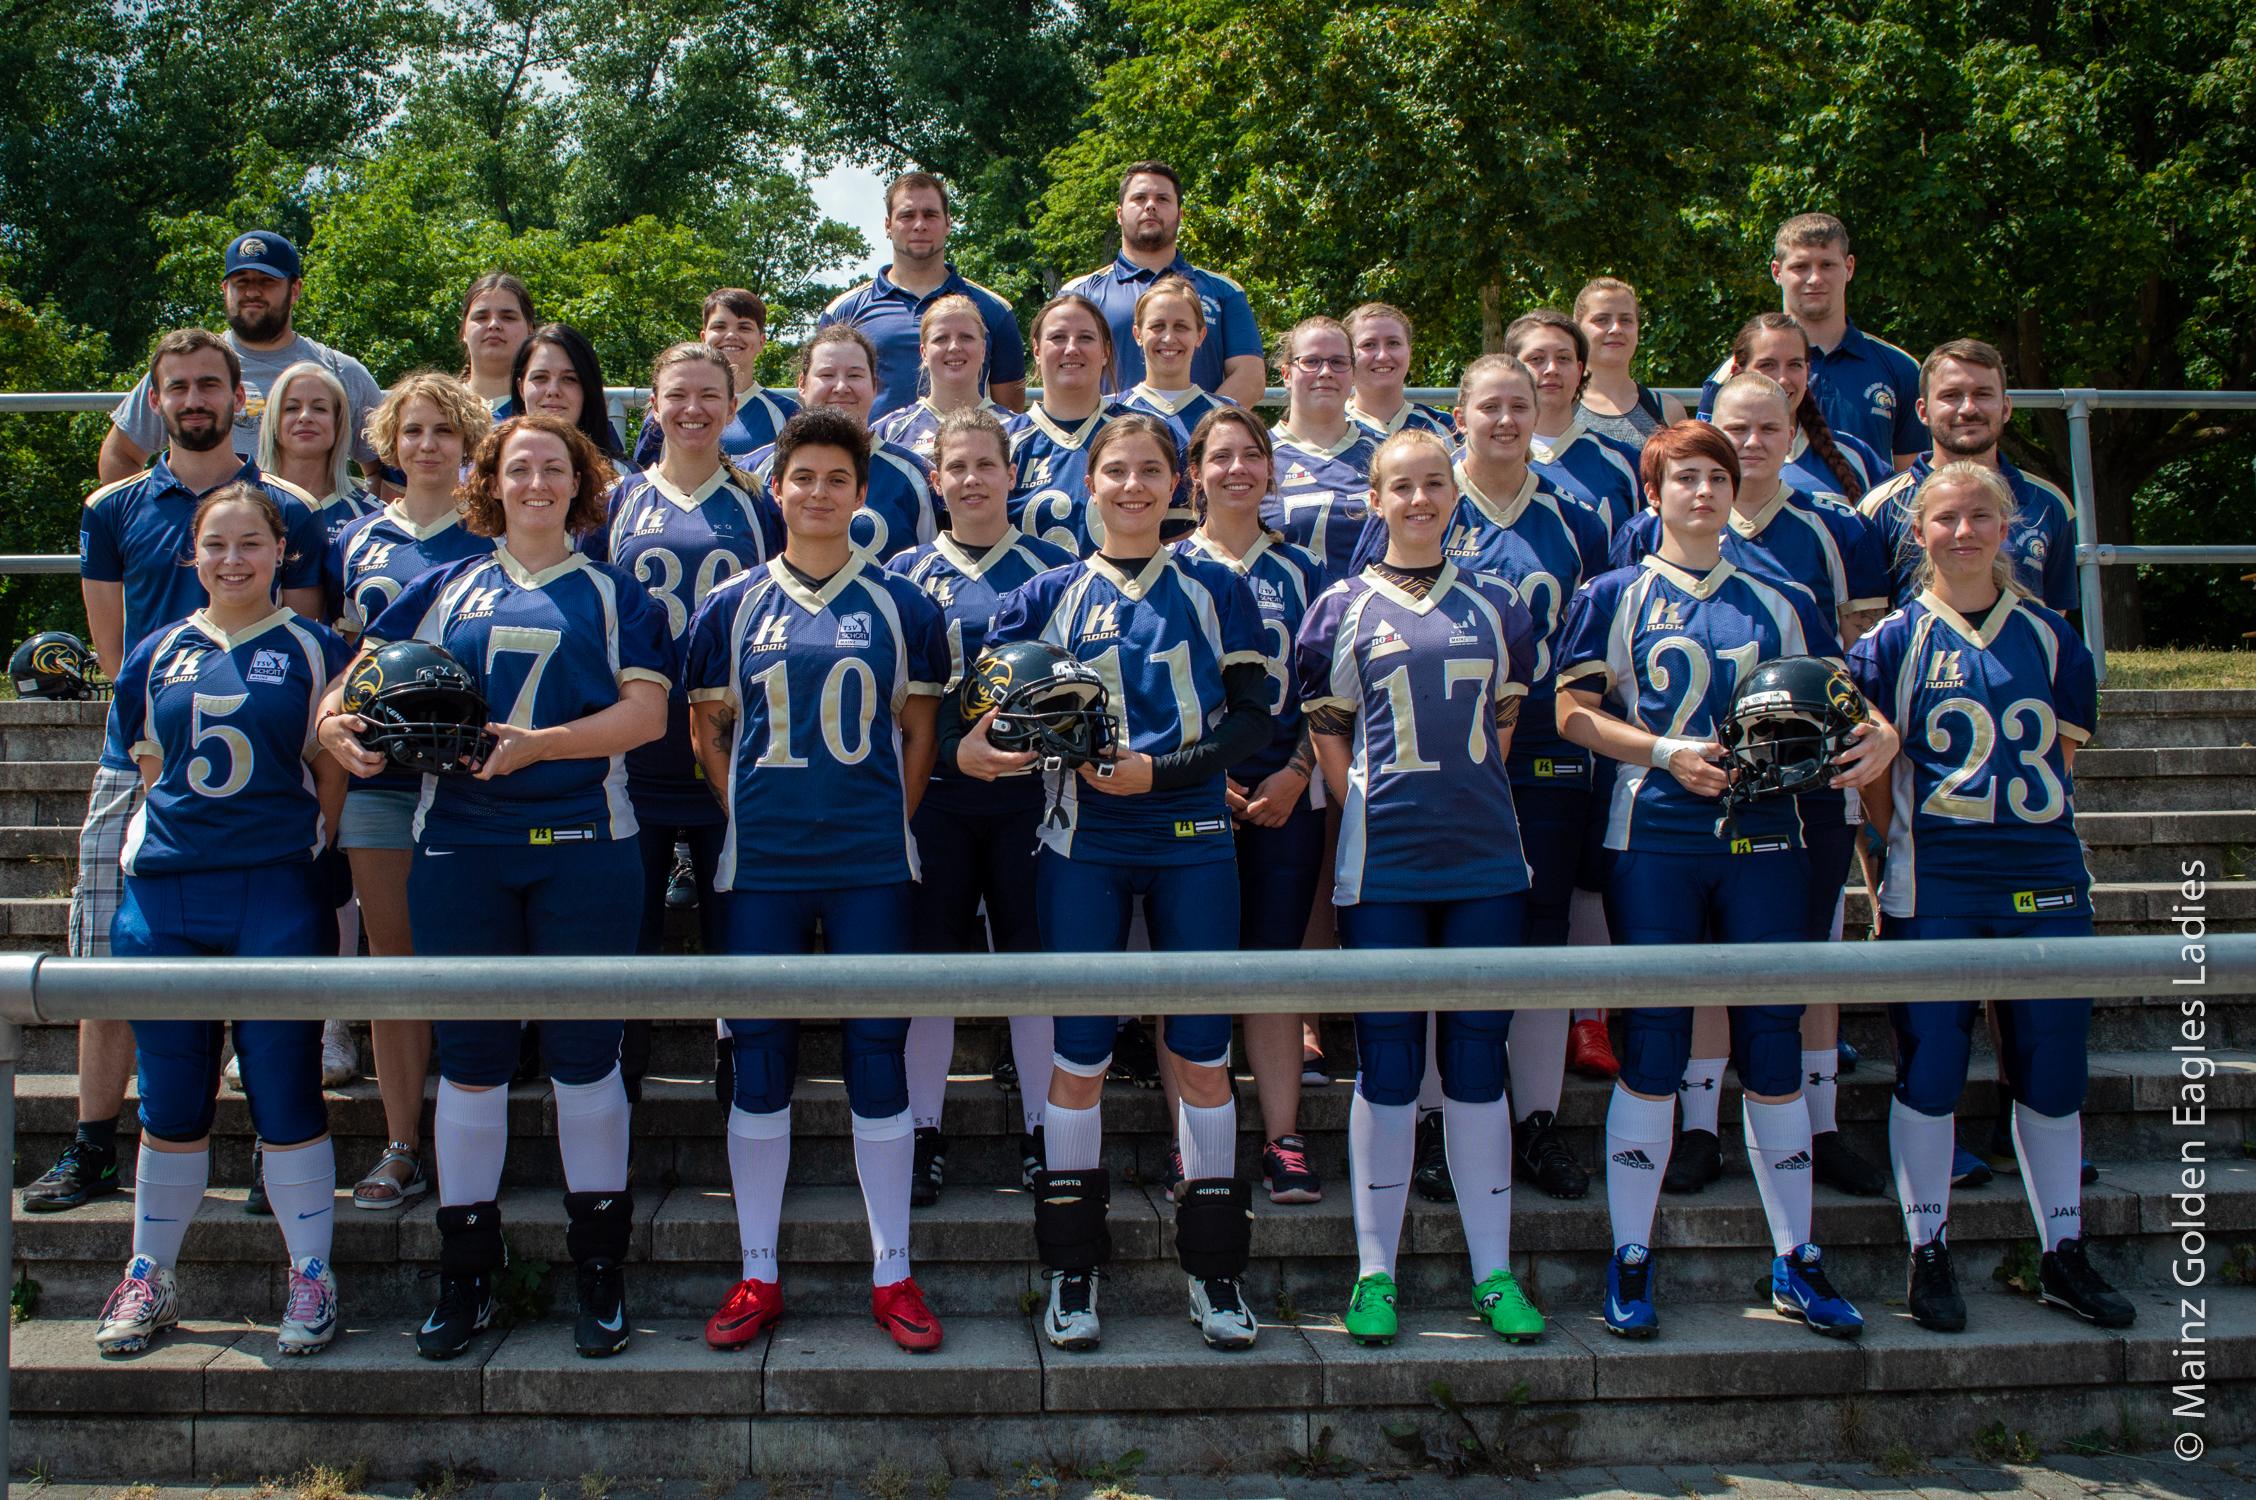 Football-Teamfoto-2018-06-10_0005